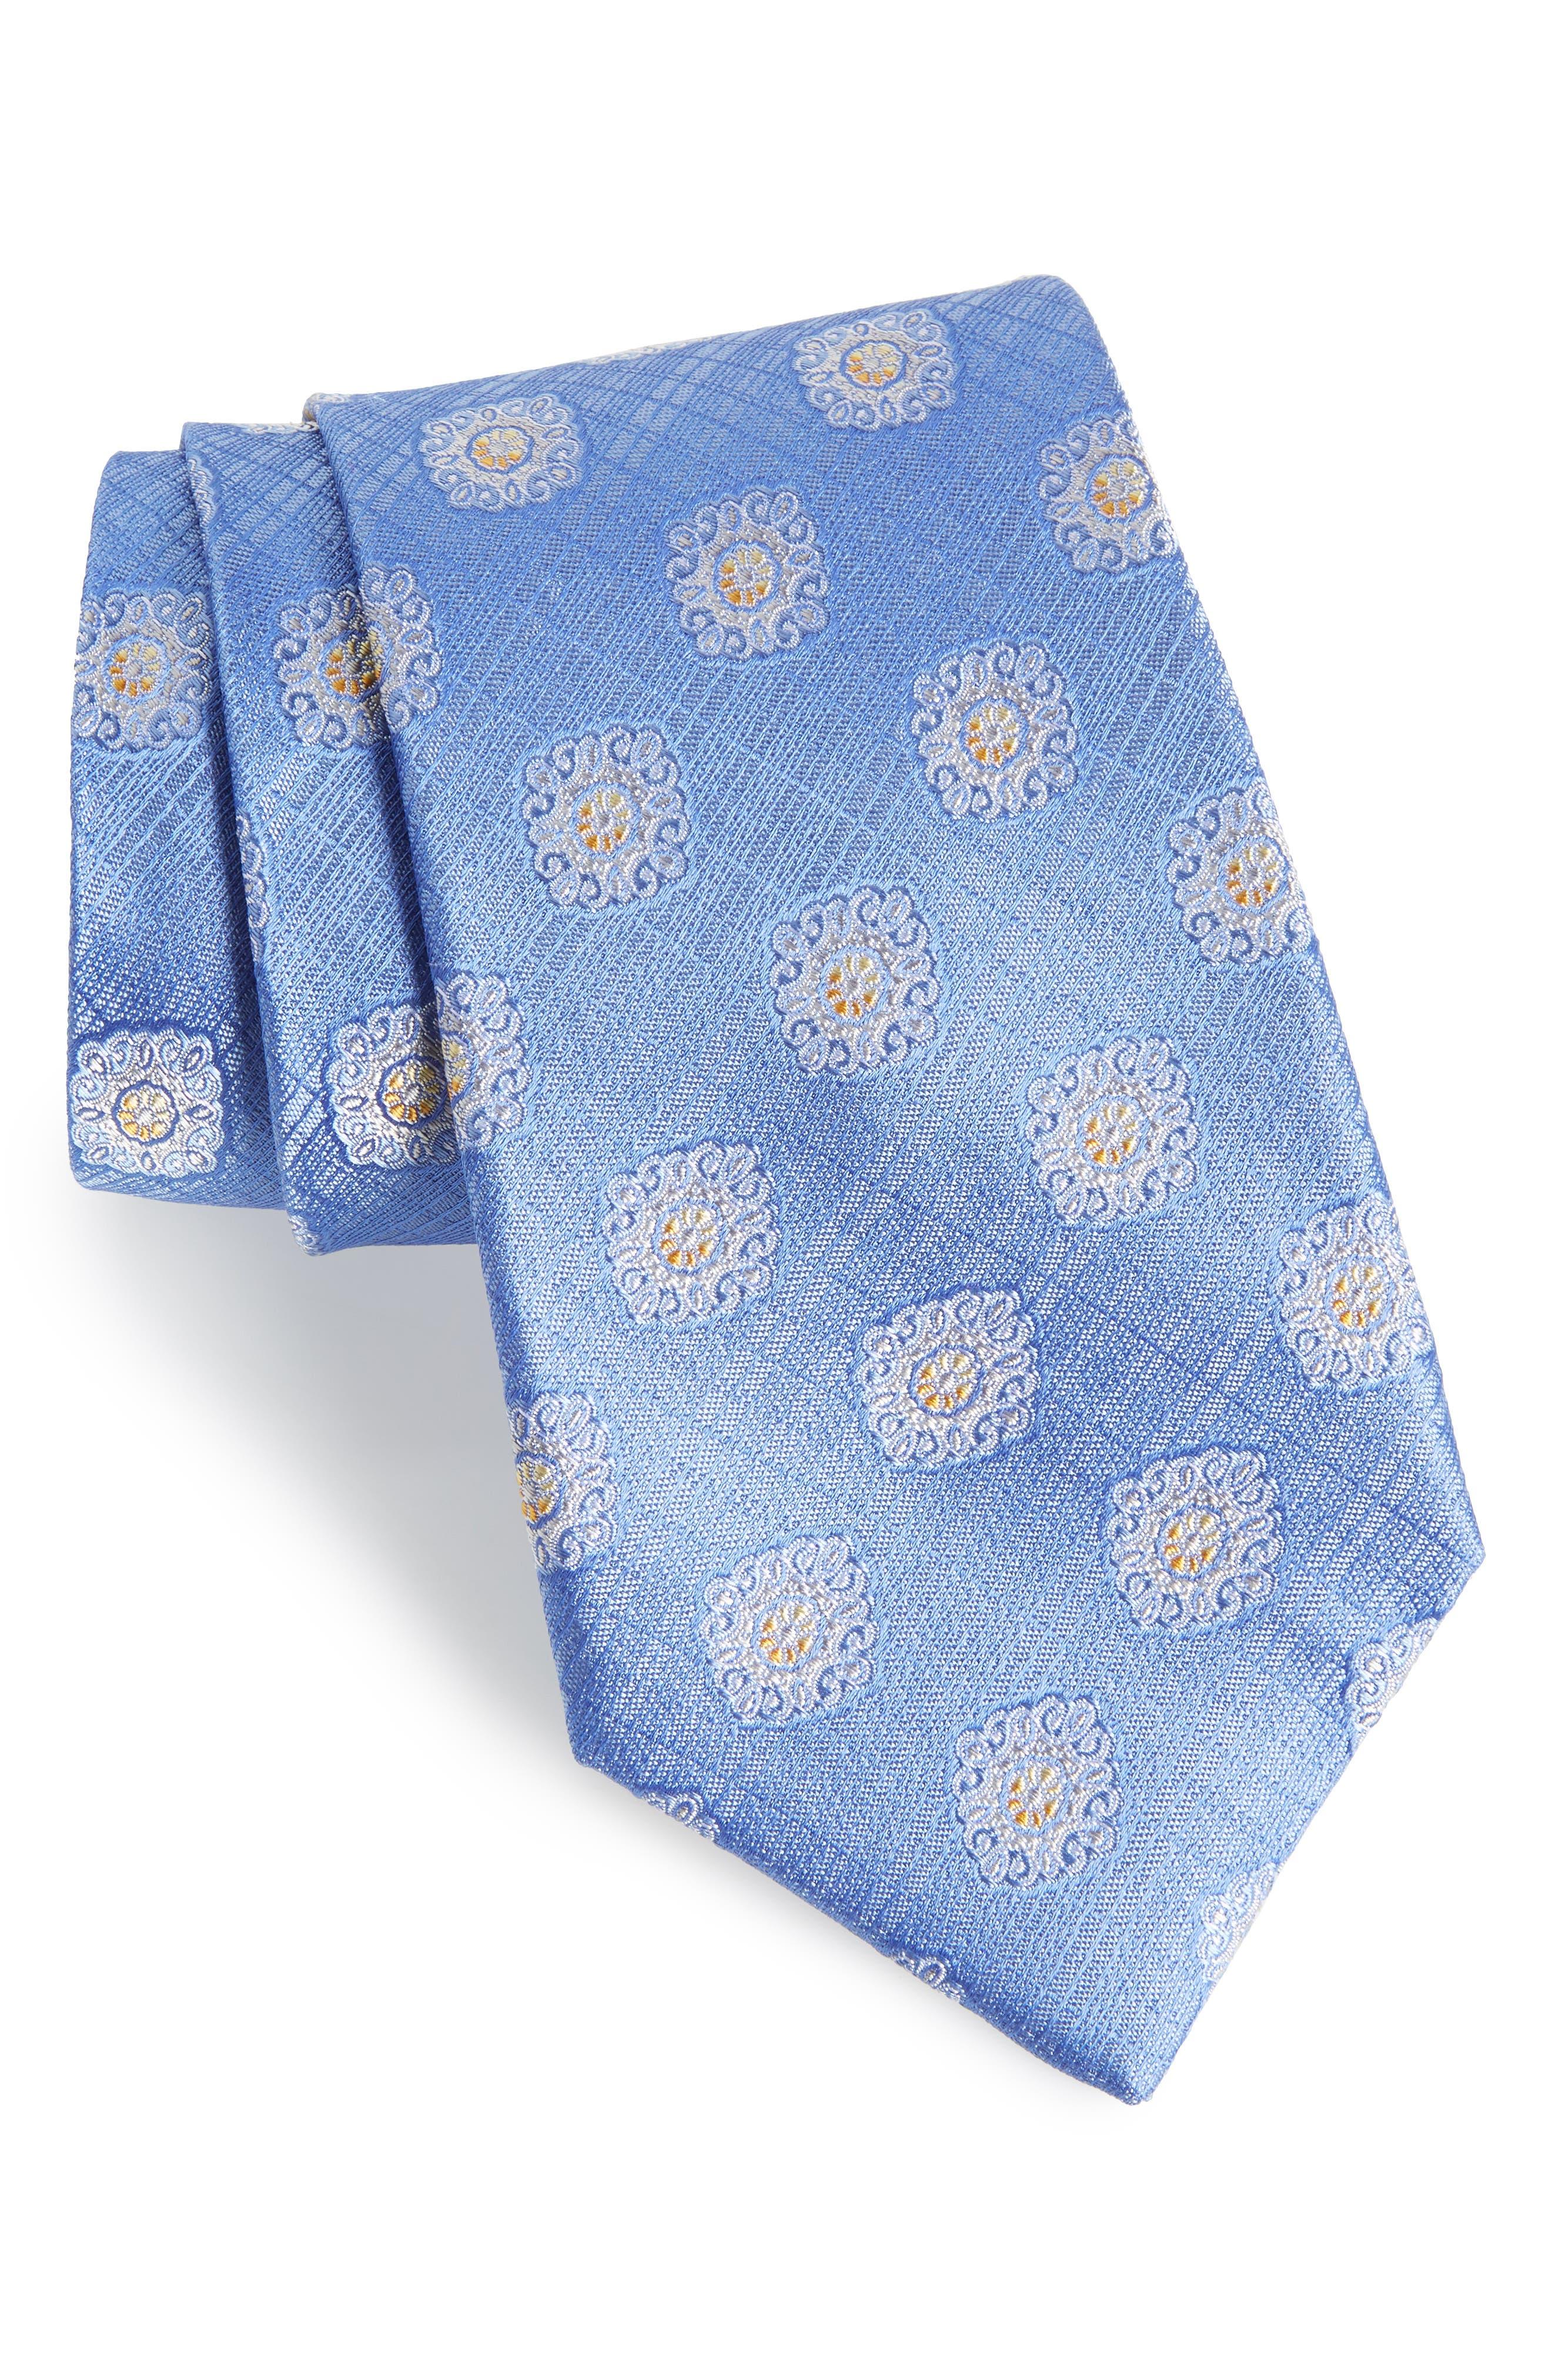 Armas Medallion Silk Tie,                             Main thumbnail 1, color,                             Blue